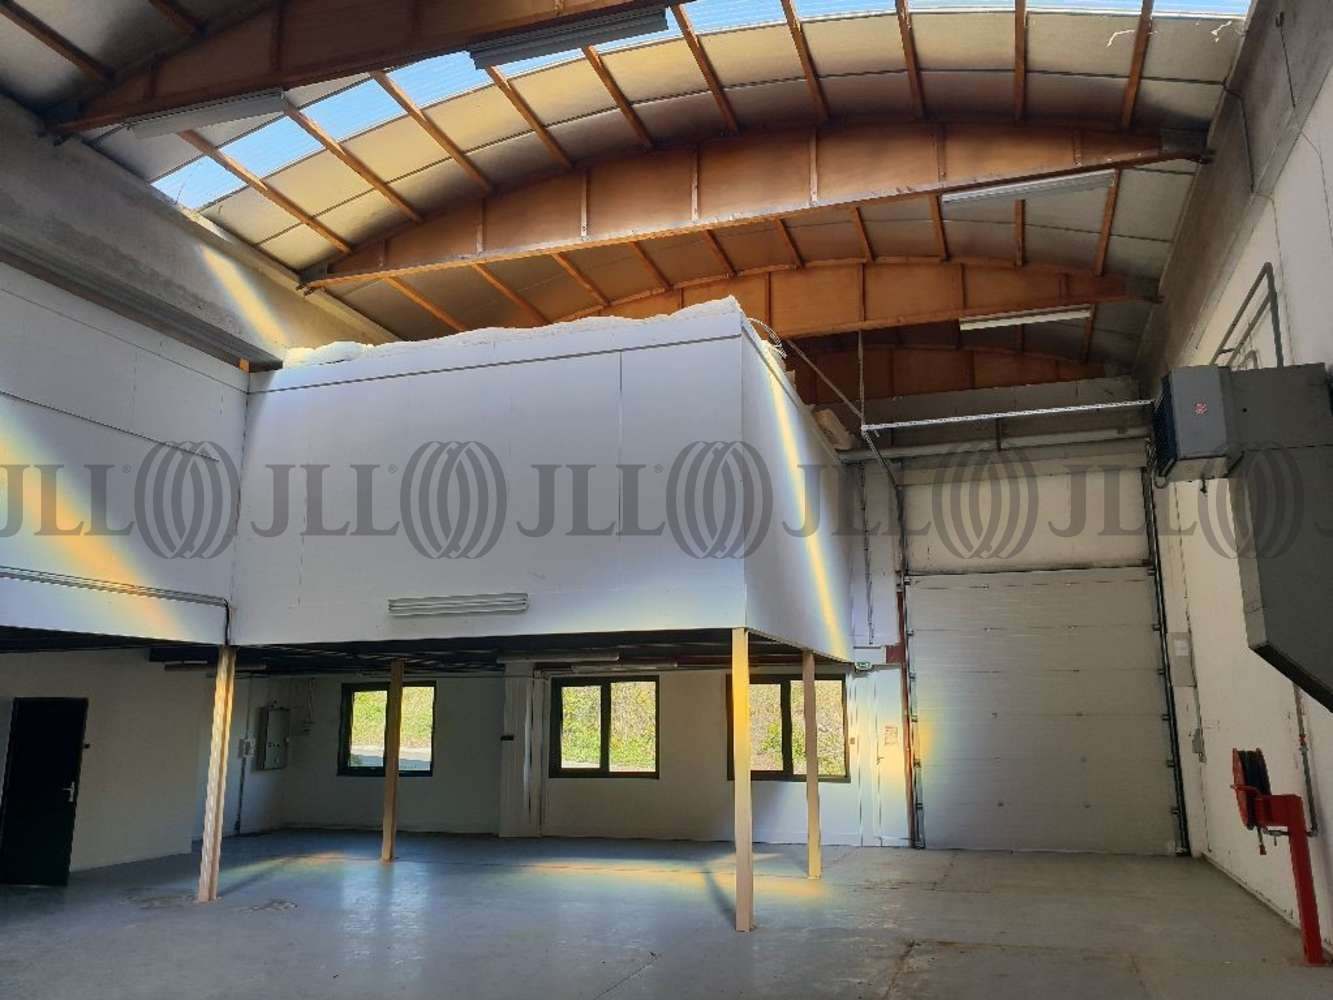 Activités/entrepôt Dardilly, 69570 - Location locaux d'activité Dardilly (69) - 10921681